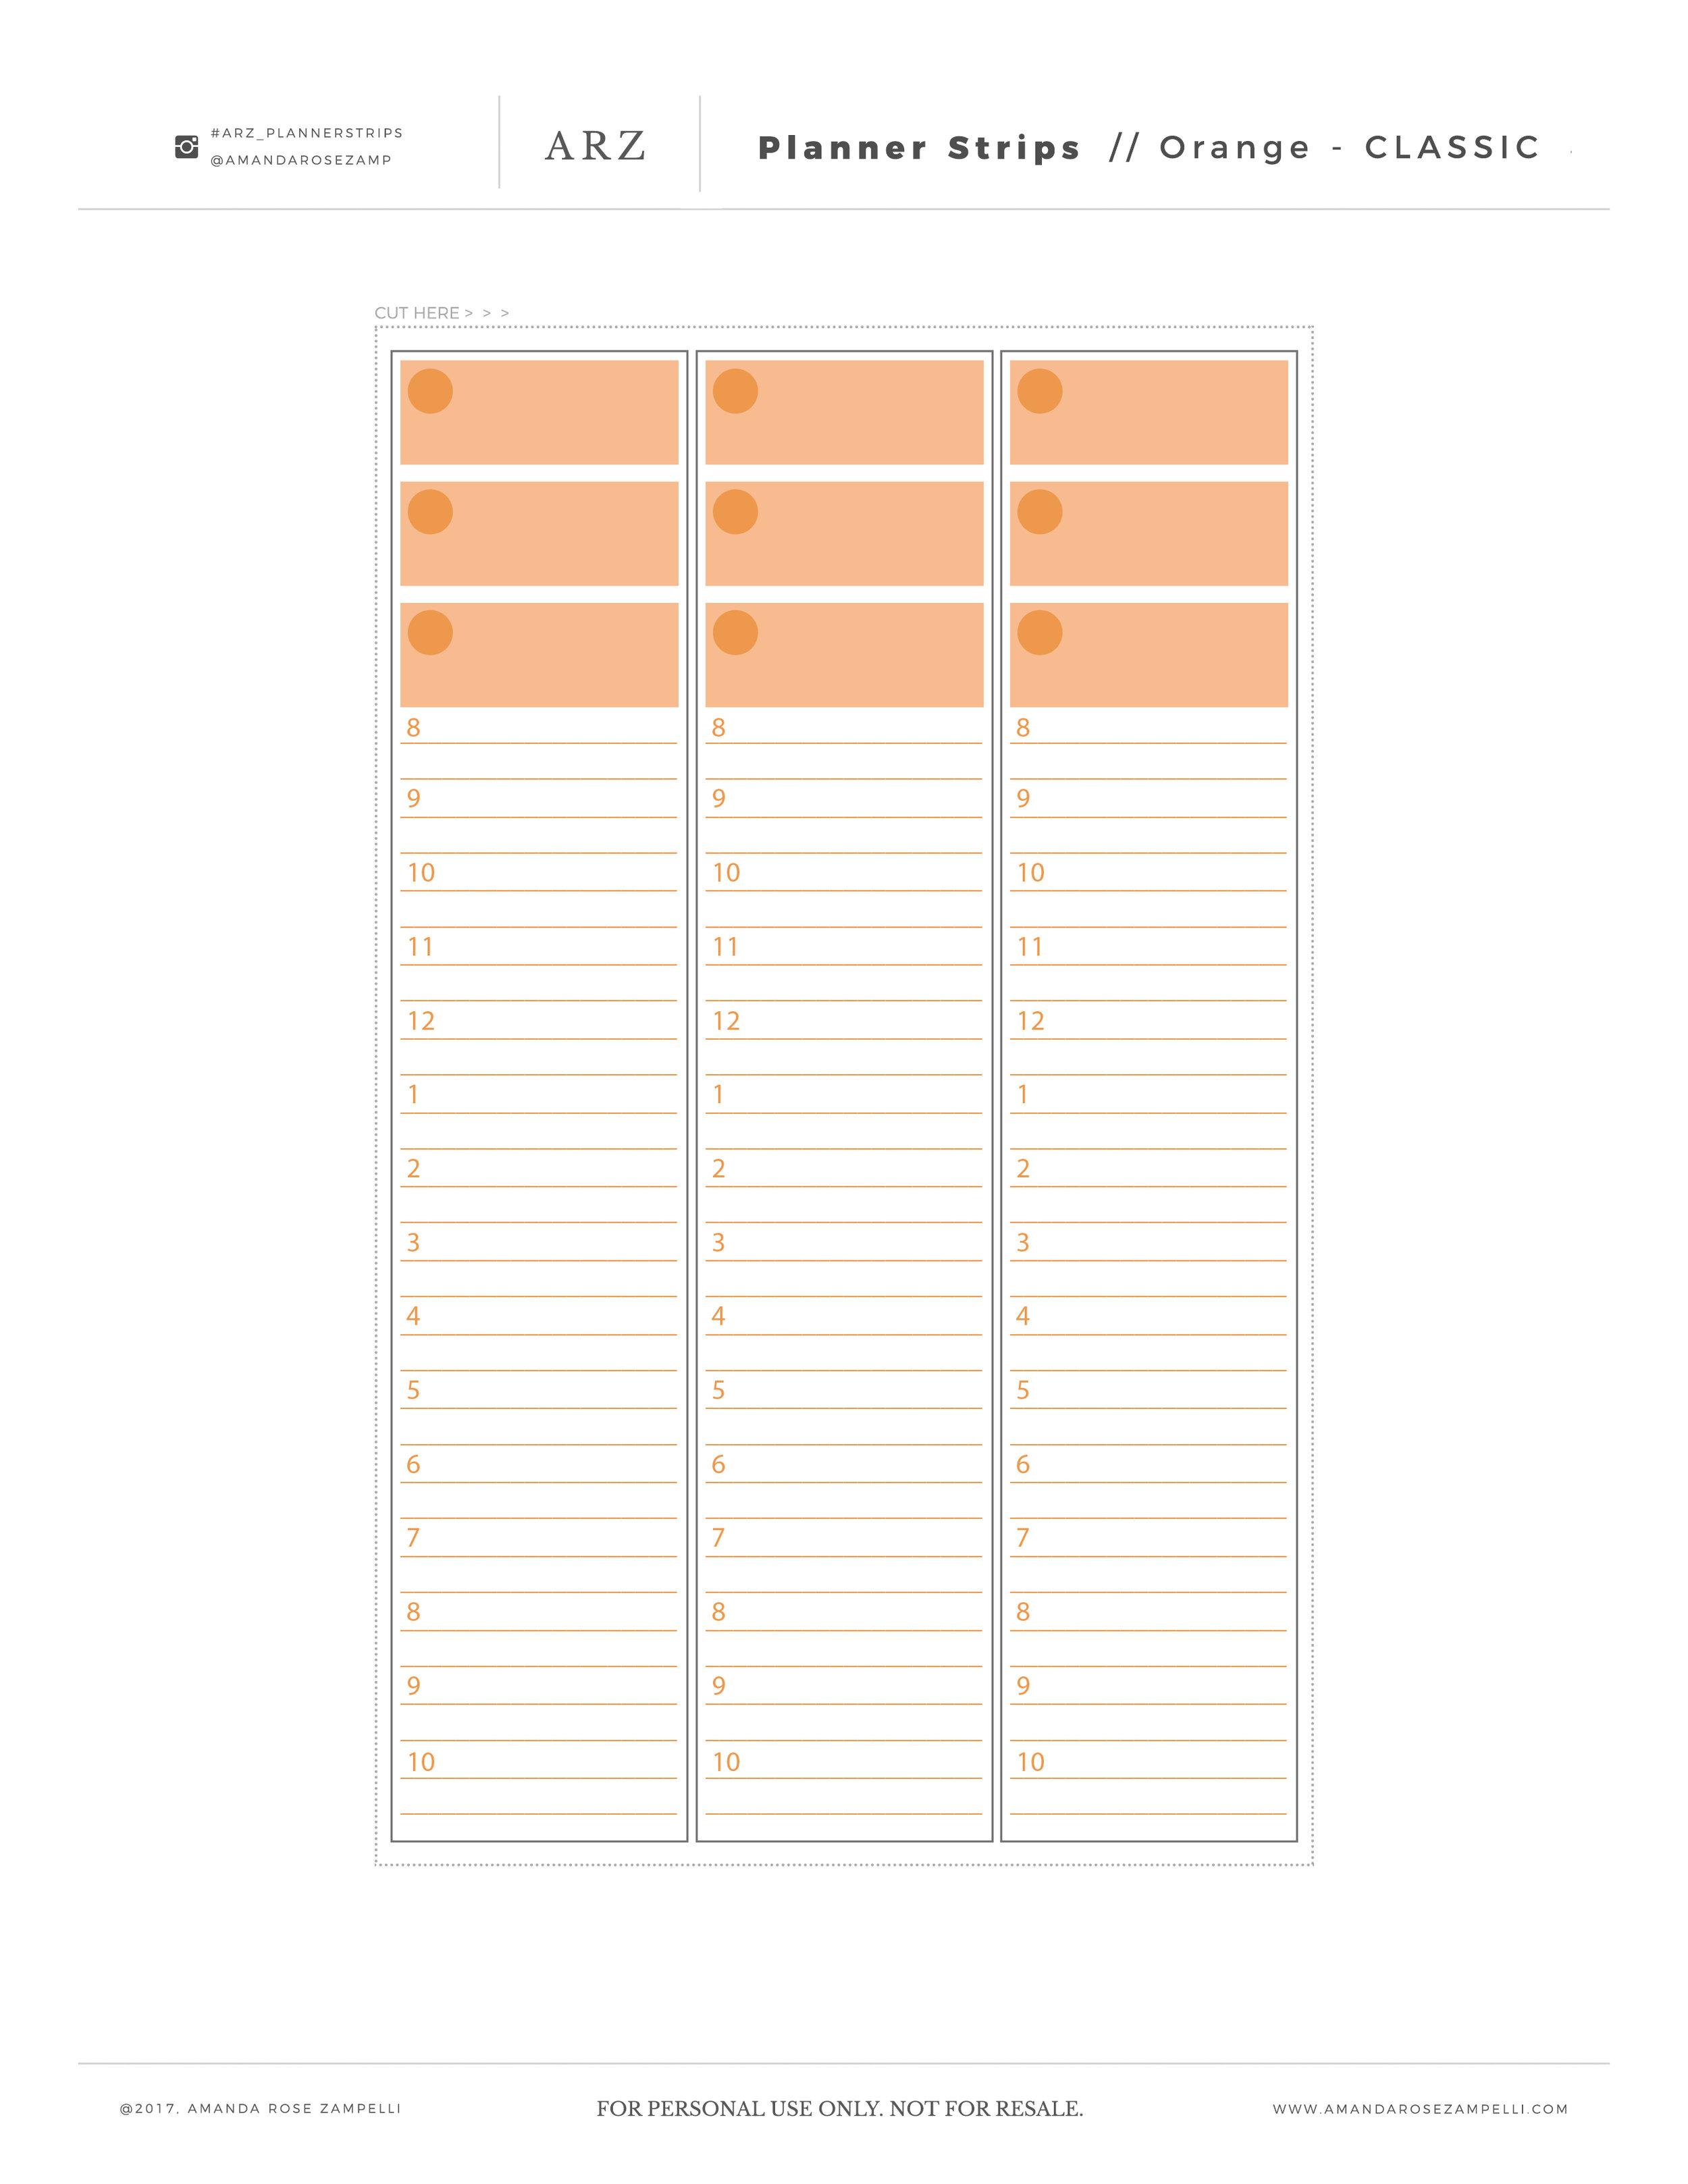 01 CLASSIC orange M - W planner strips.jpg